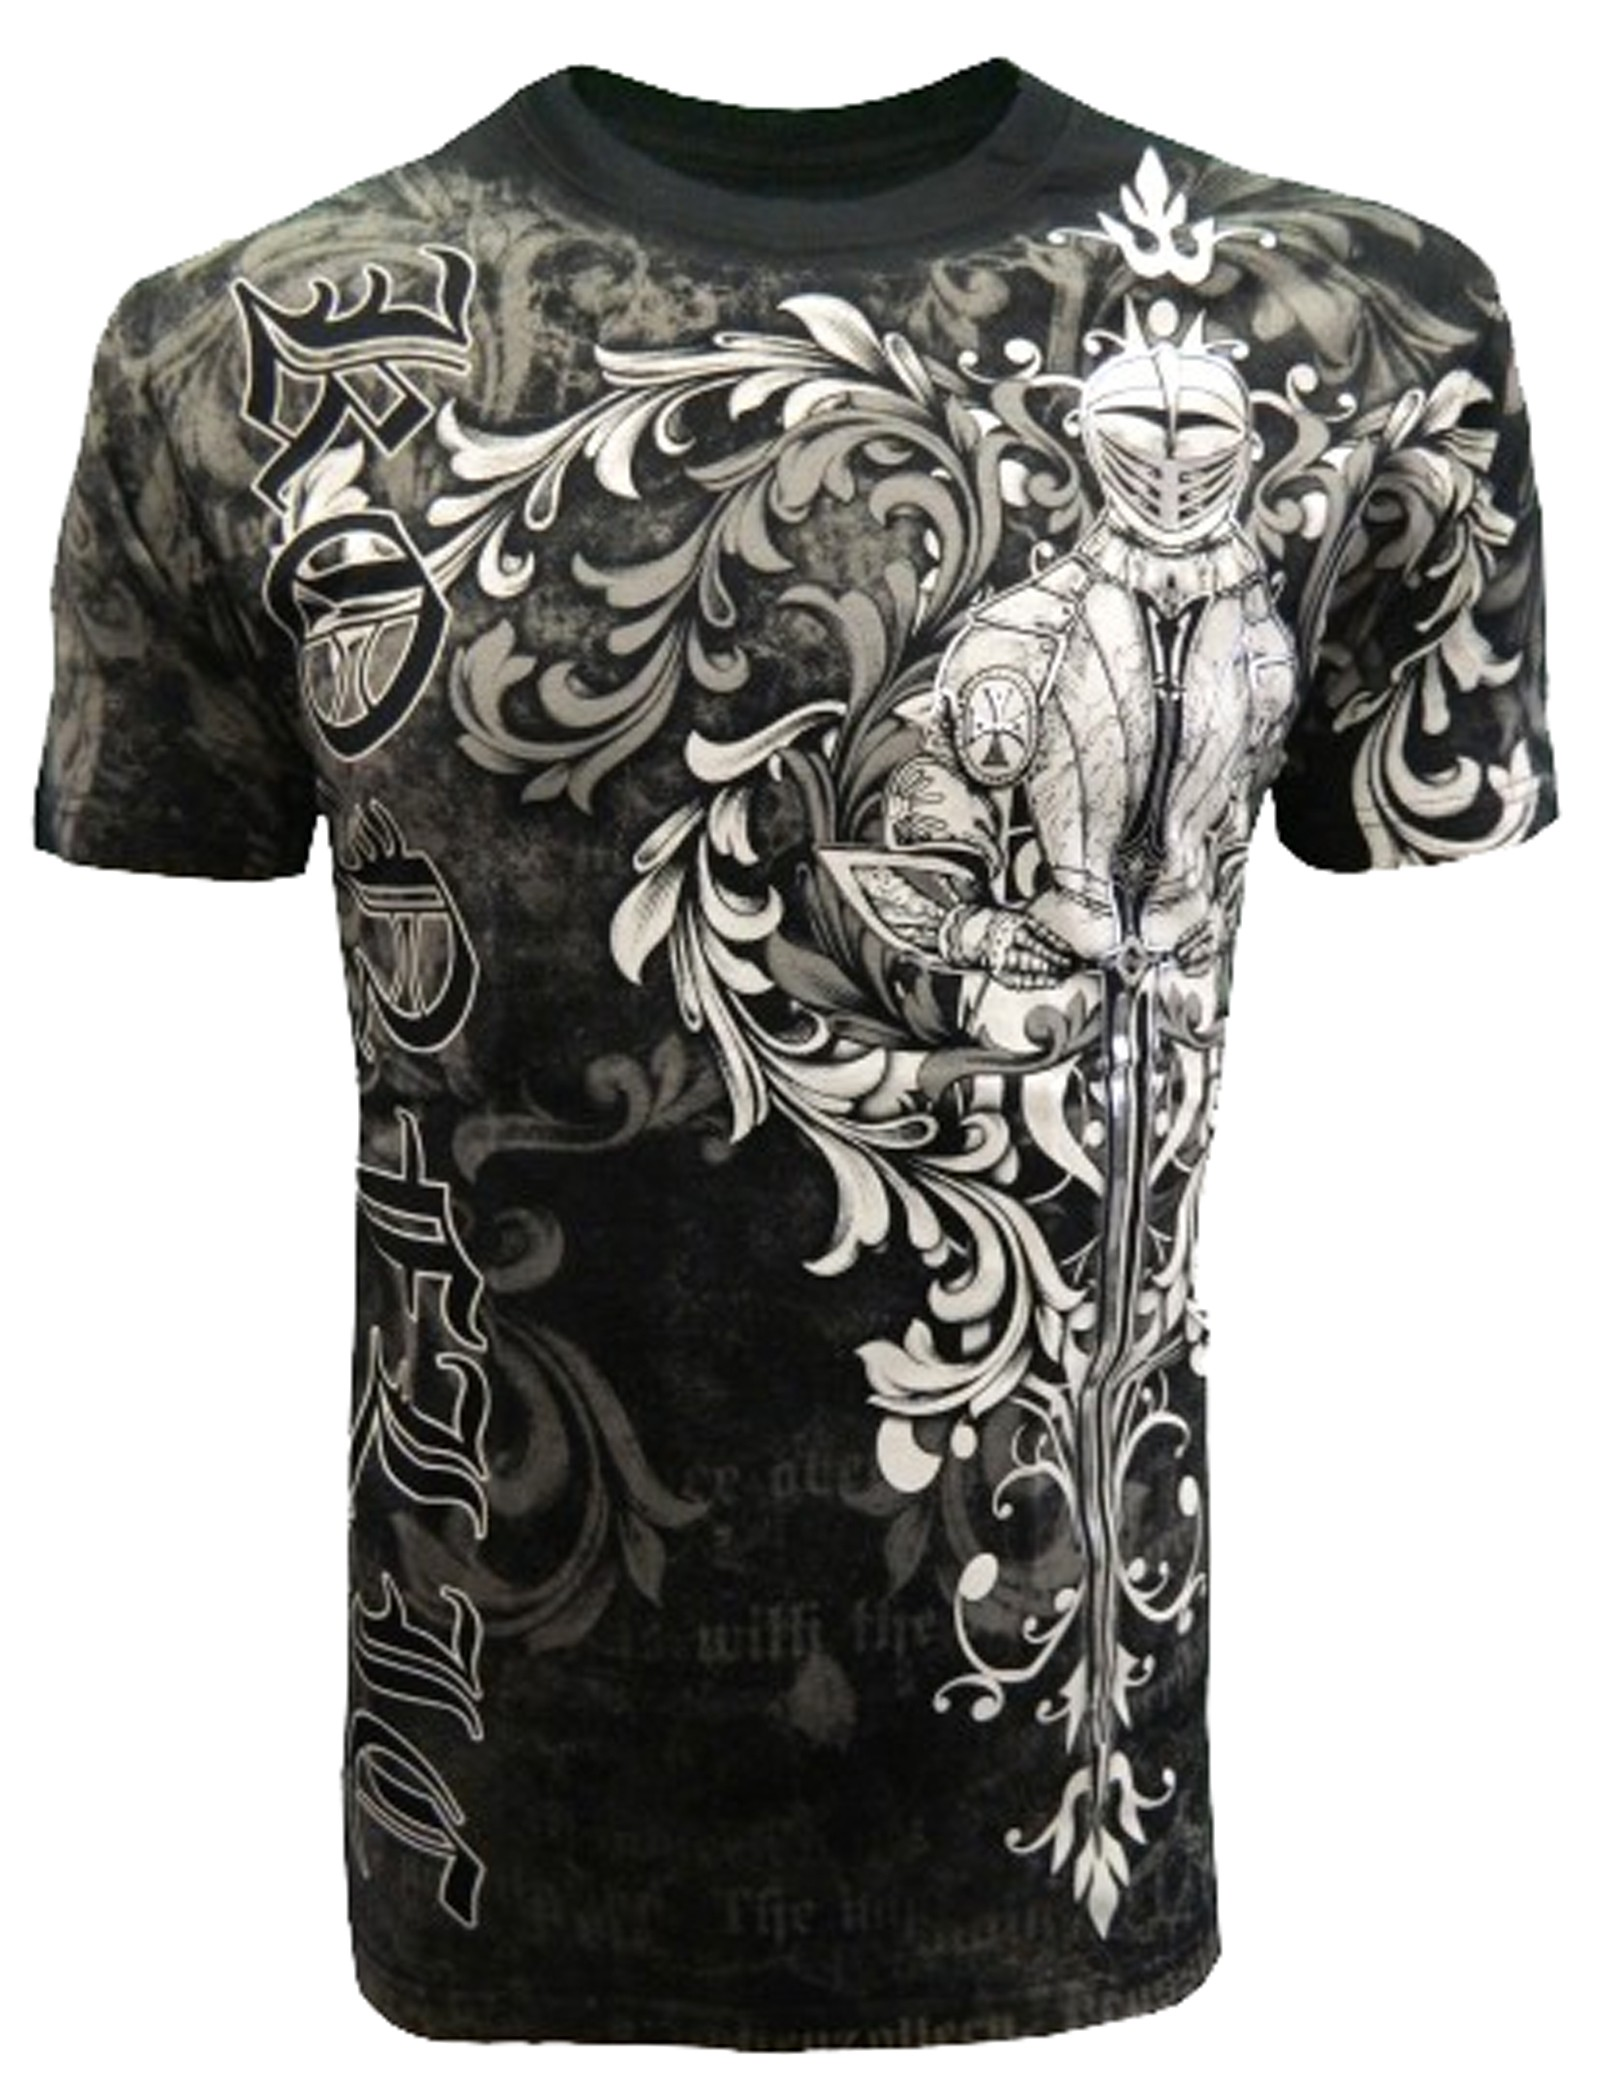 Konflic Clothing - Knight Wars T-Shirt